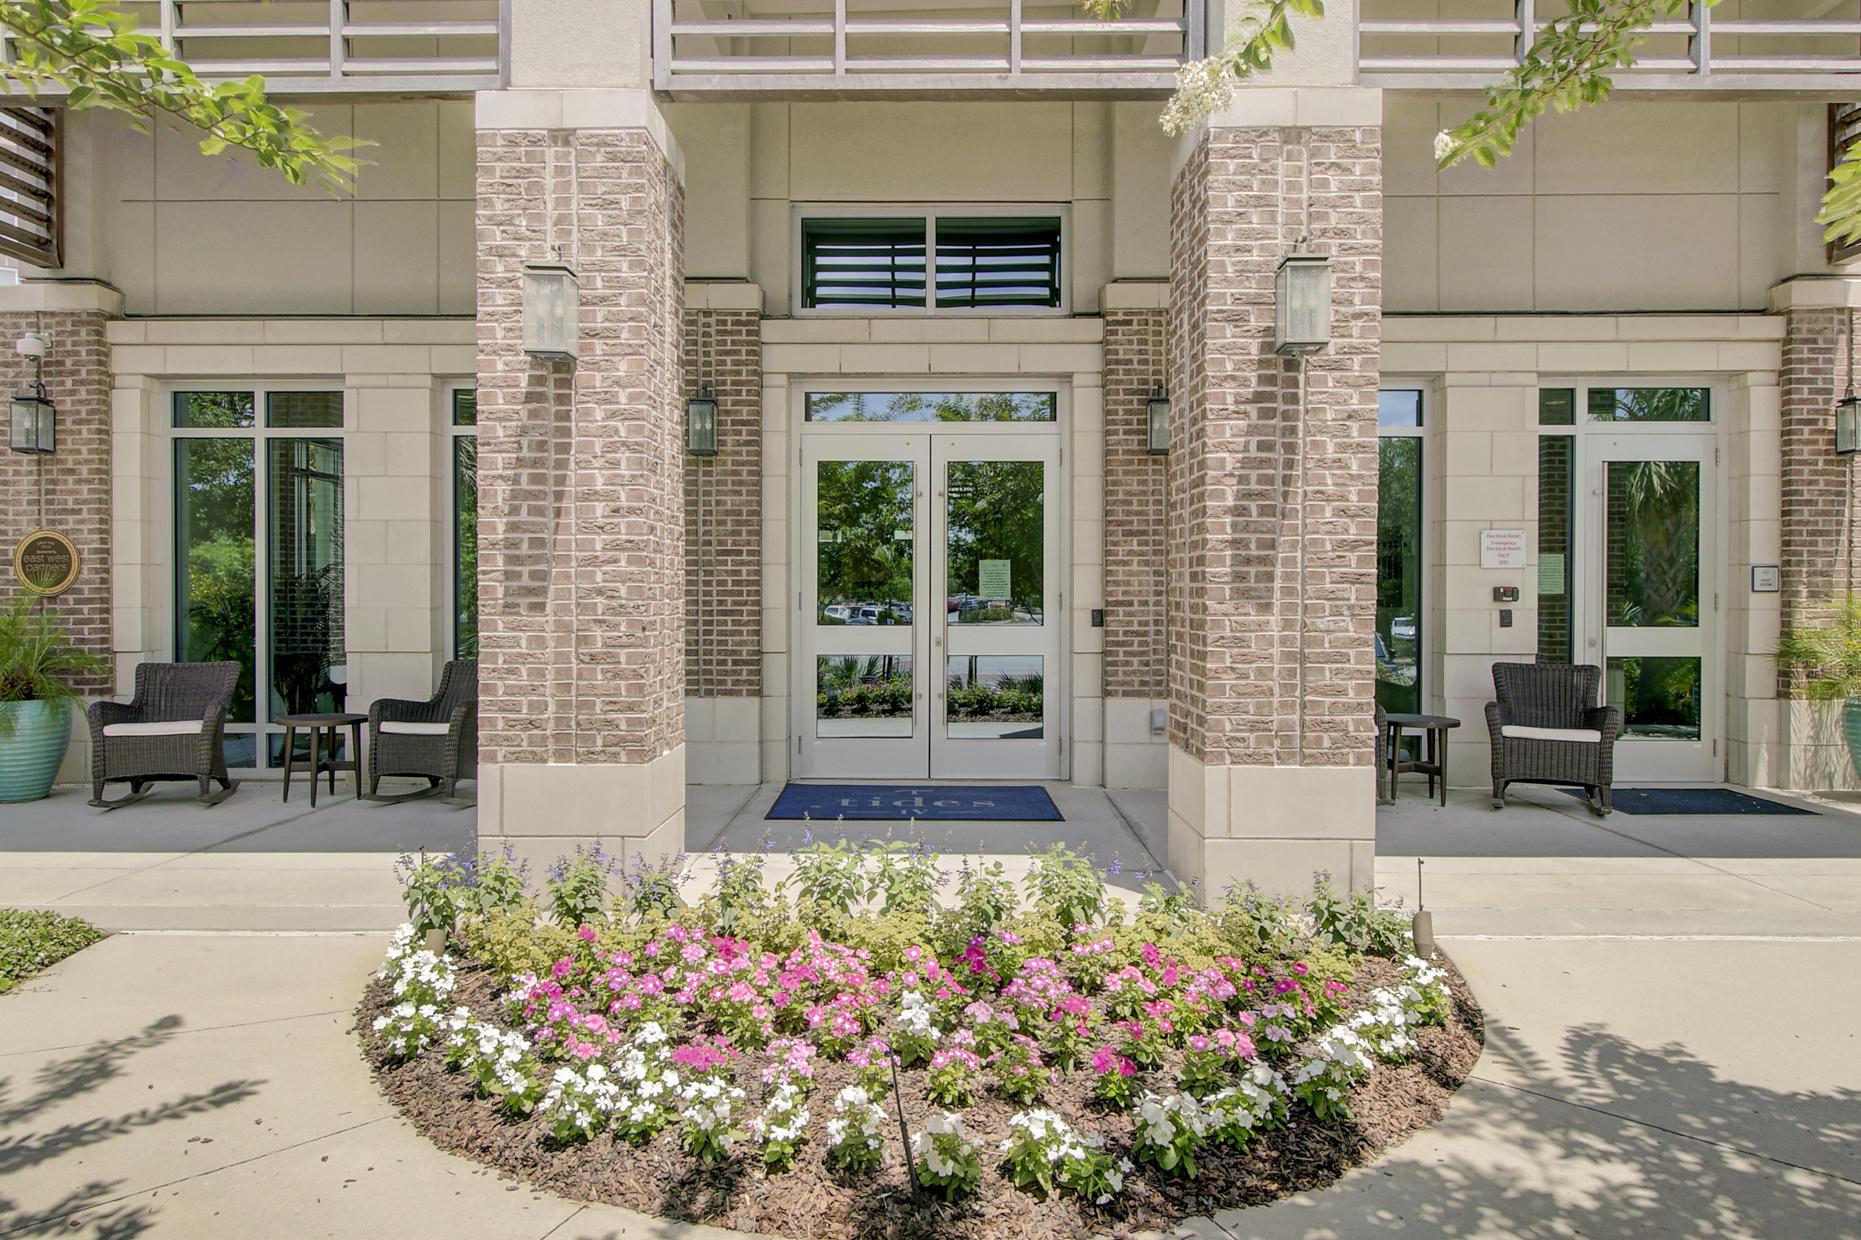 Tides IV Condominiums Homes For Sale - 155 Wingo Way, Mount Pleasant, SC - 17